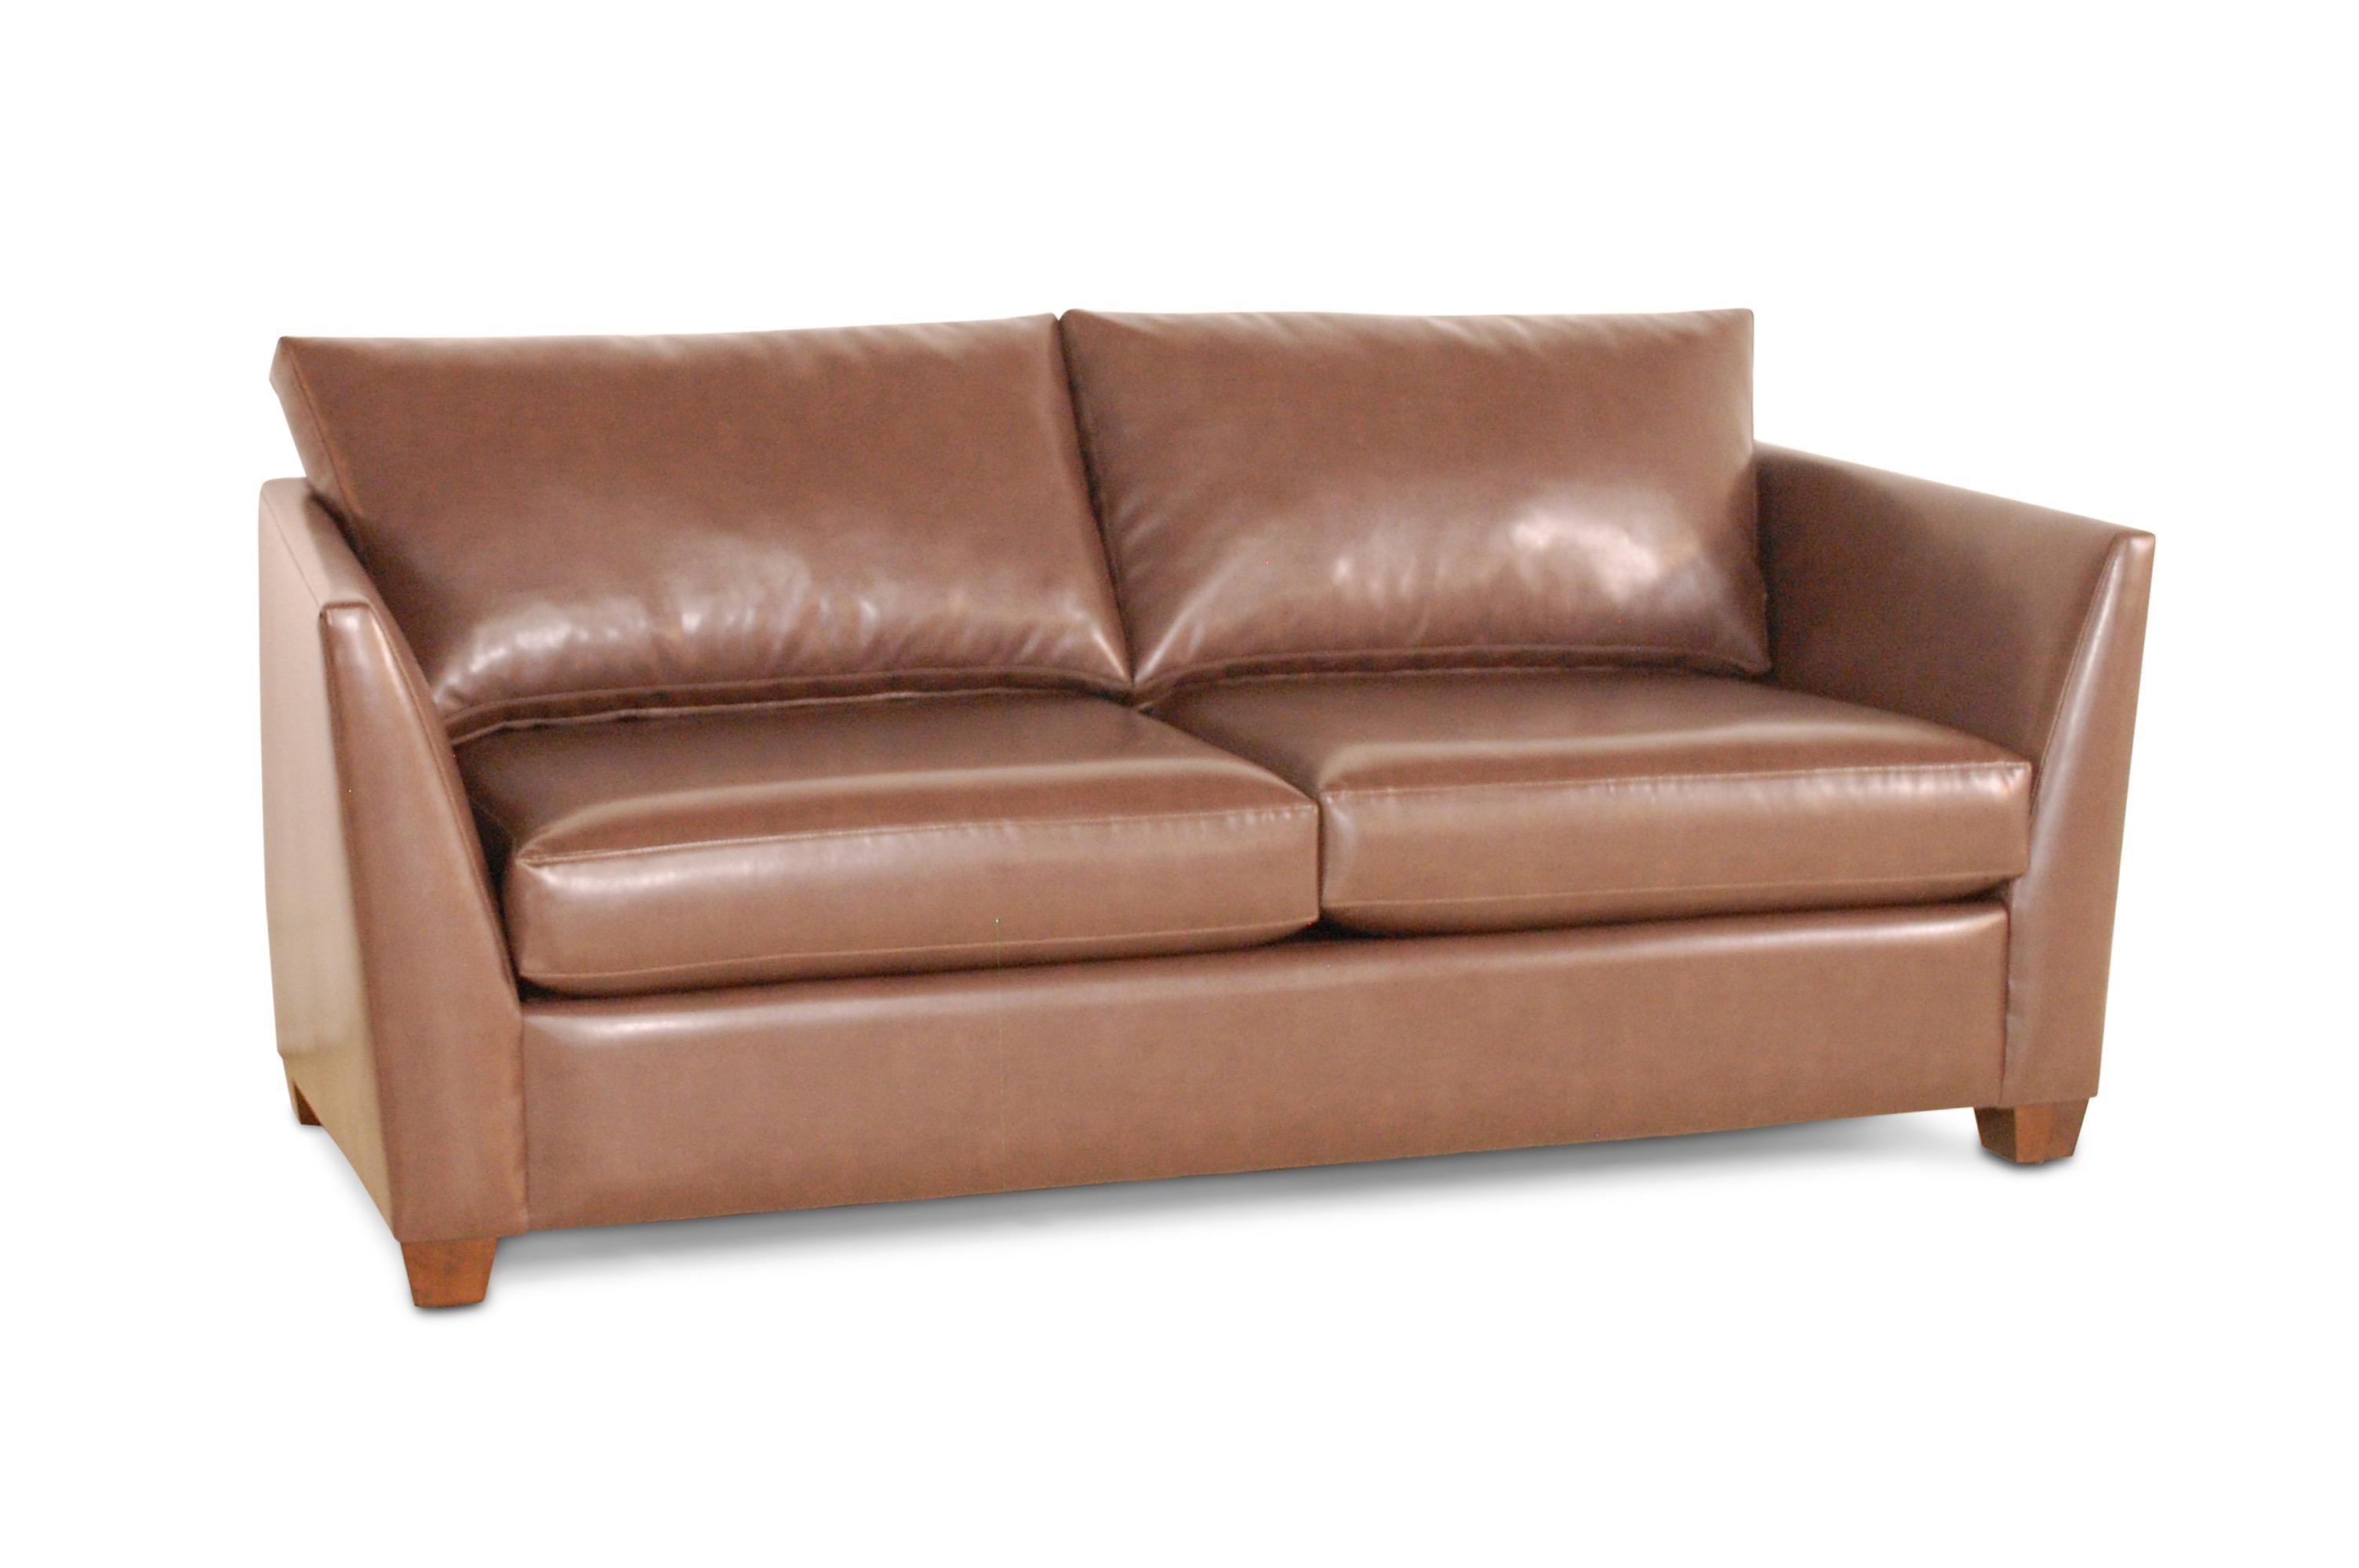 Pacific Furniture Custom Furniture Stockholm Sleeper Sofa